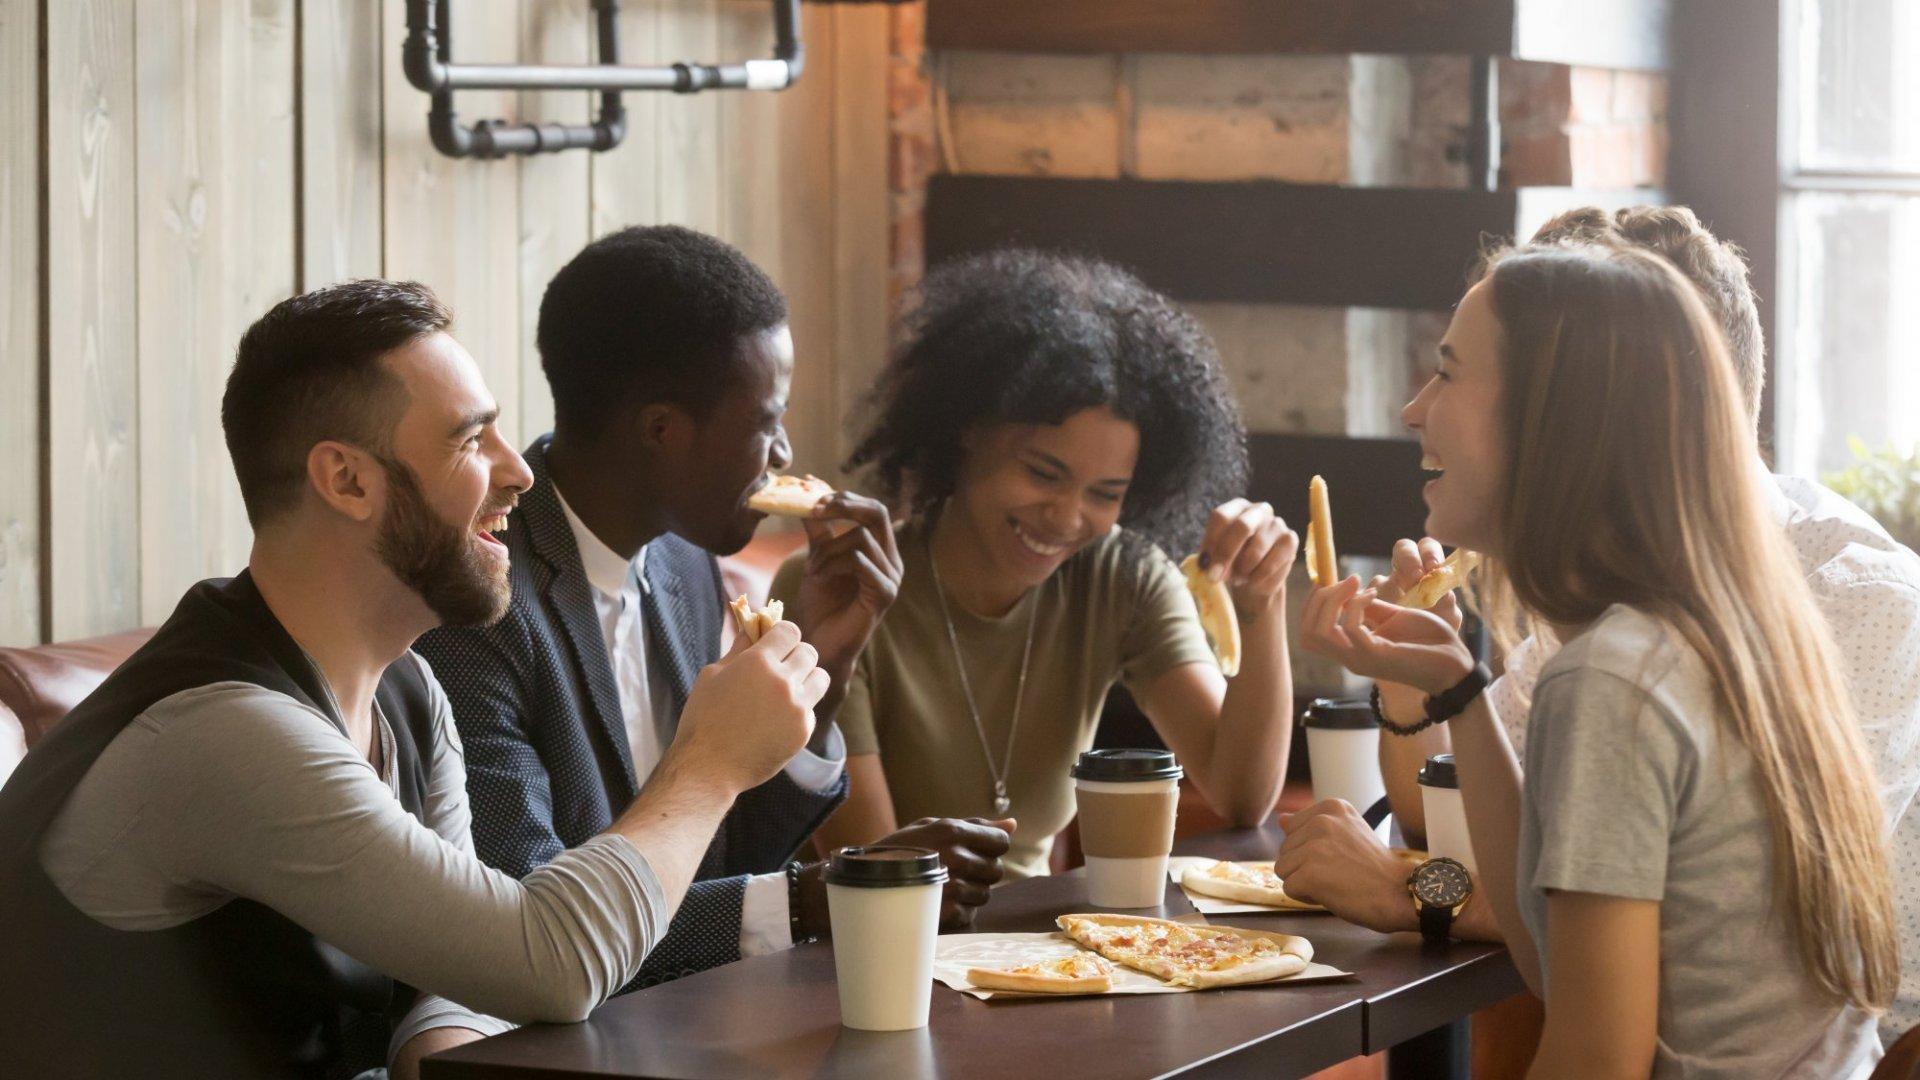 5 Marketing Strategies That Will Win Over Millennials